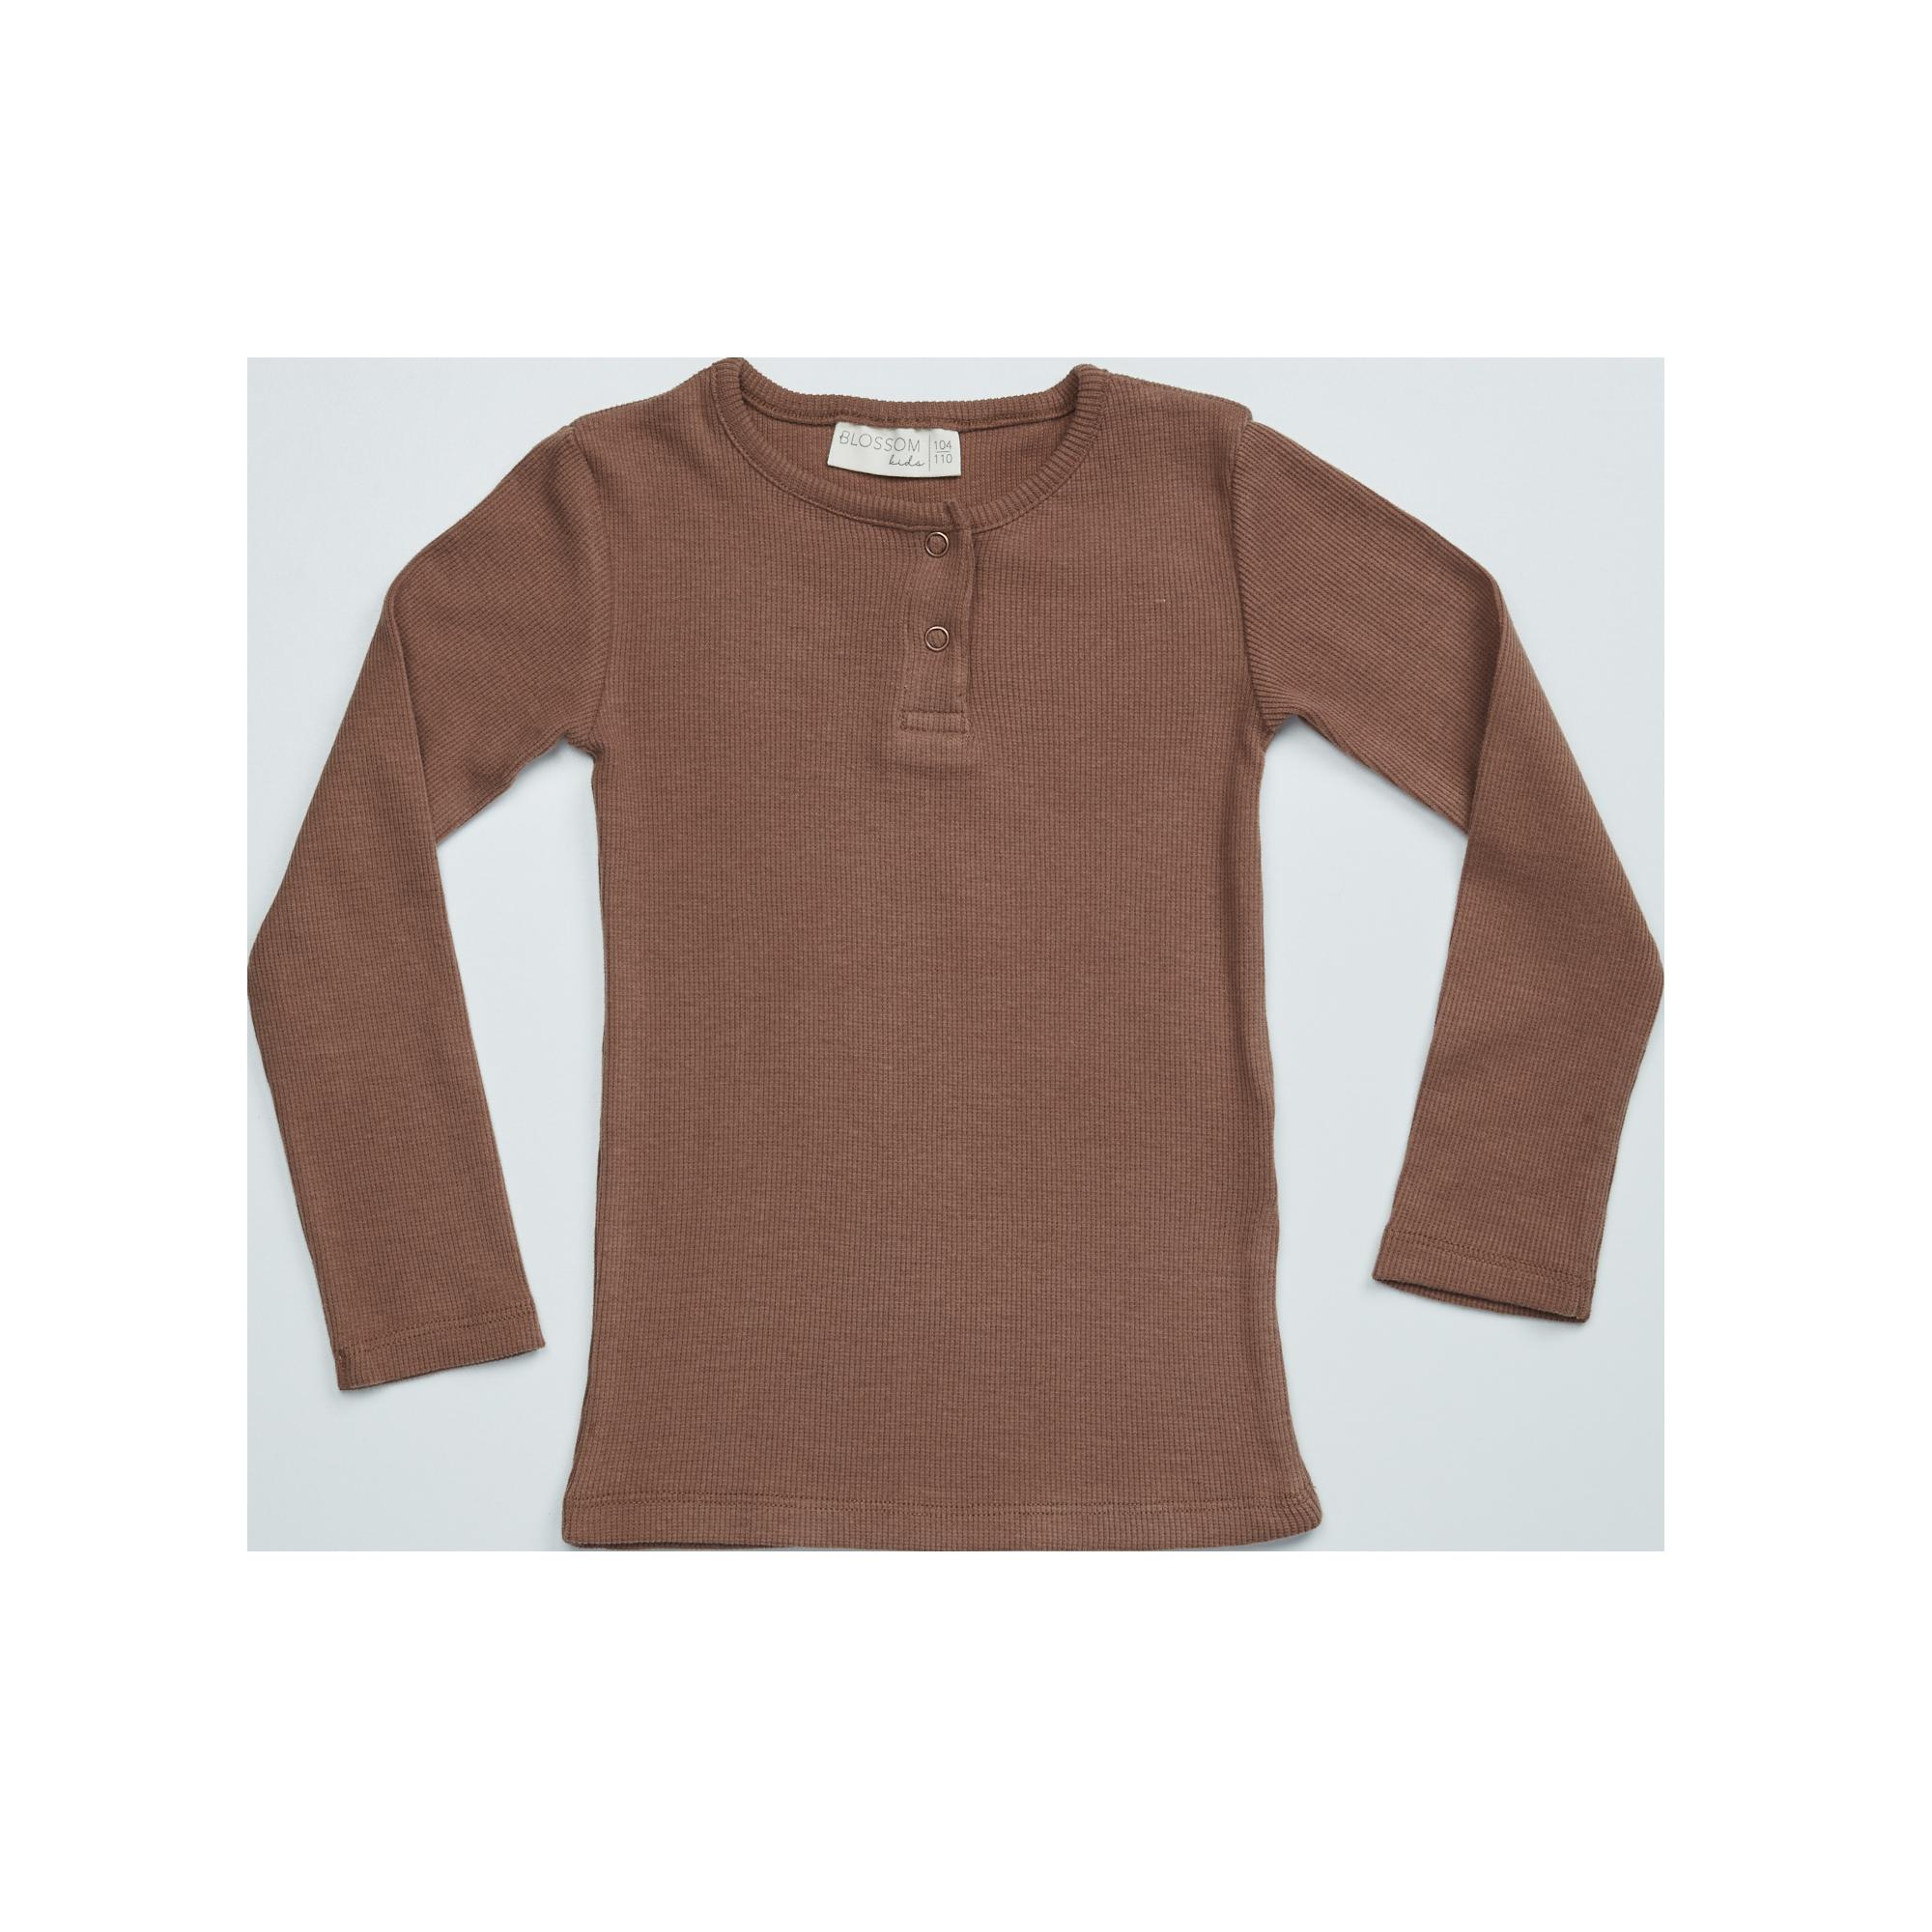 Blossom Kids Long sleeve - soft rib - Smoked Hazelnut-1